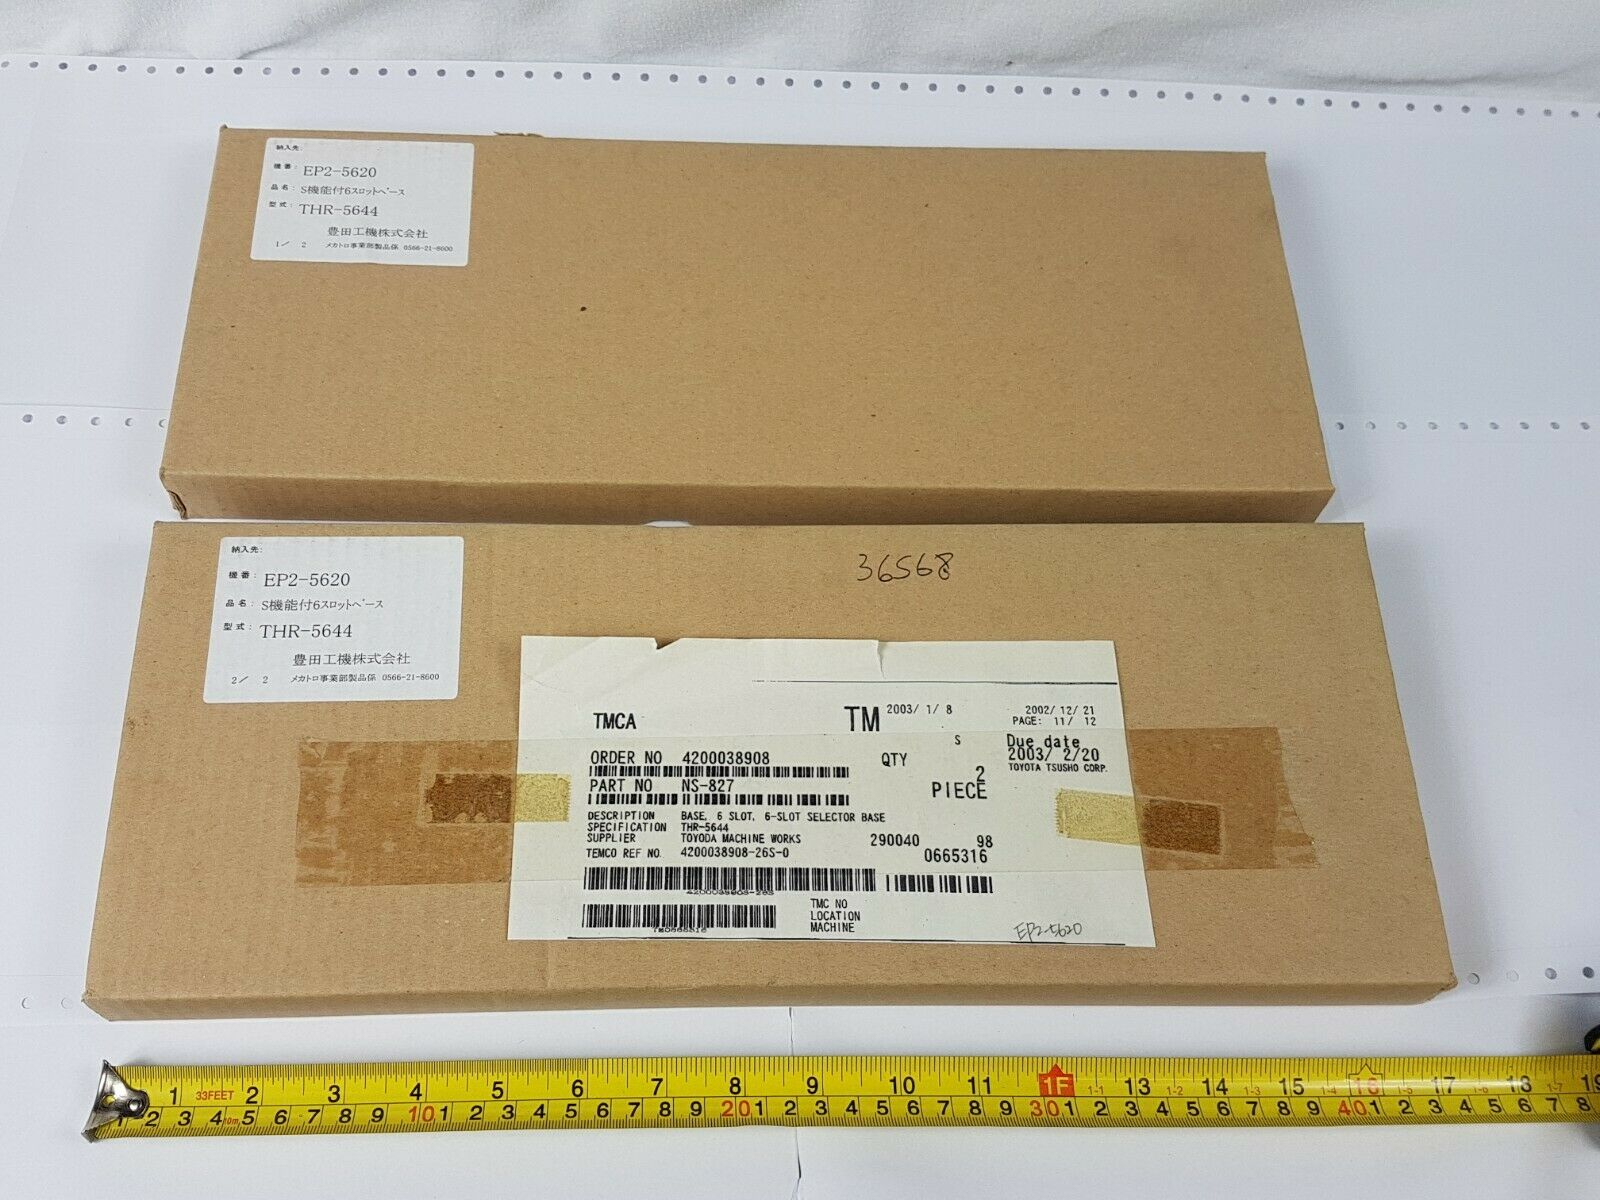 Toyopuc THR-5644 6-slot Selector Base NS-827 Jtekt Toyoda TP-4621-1 New